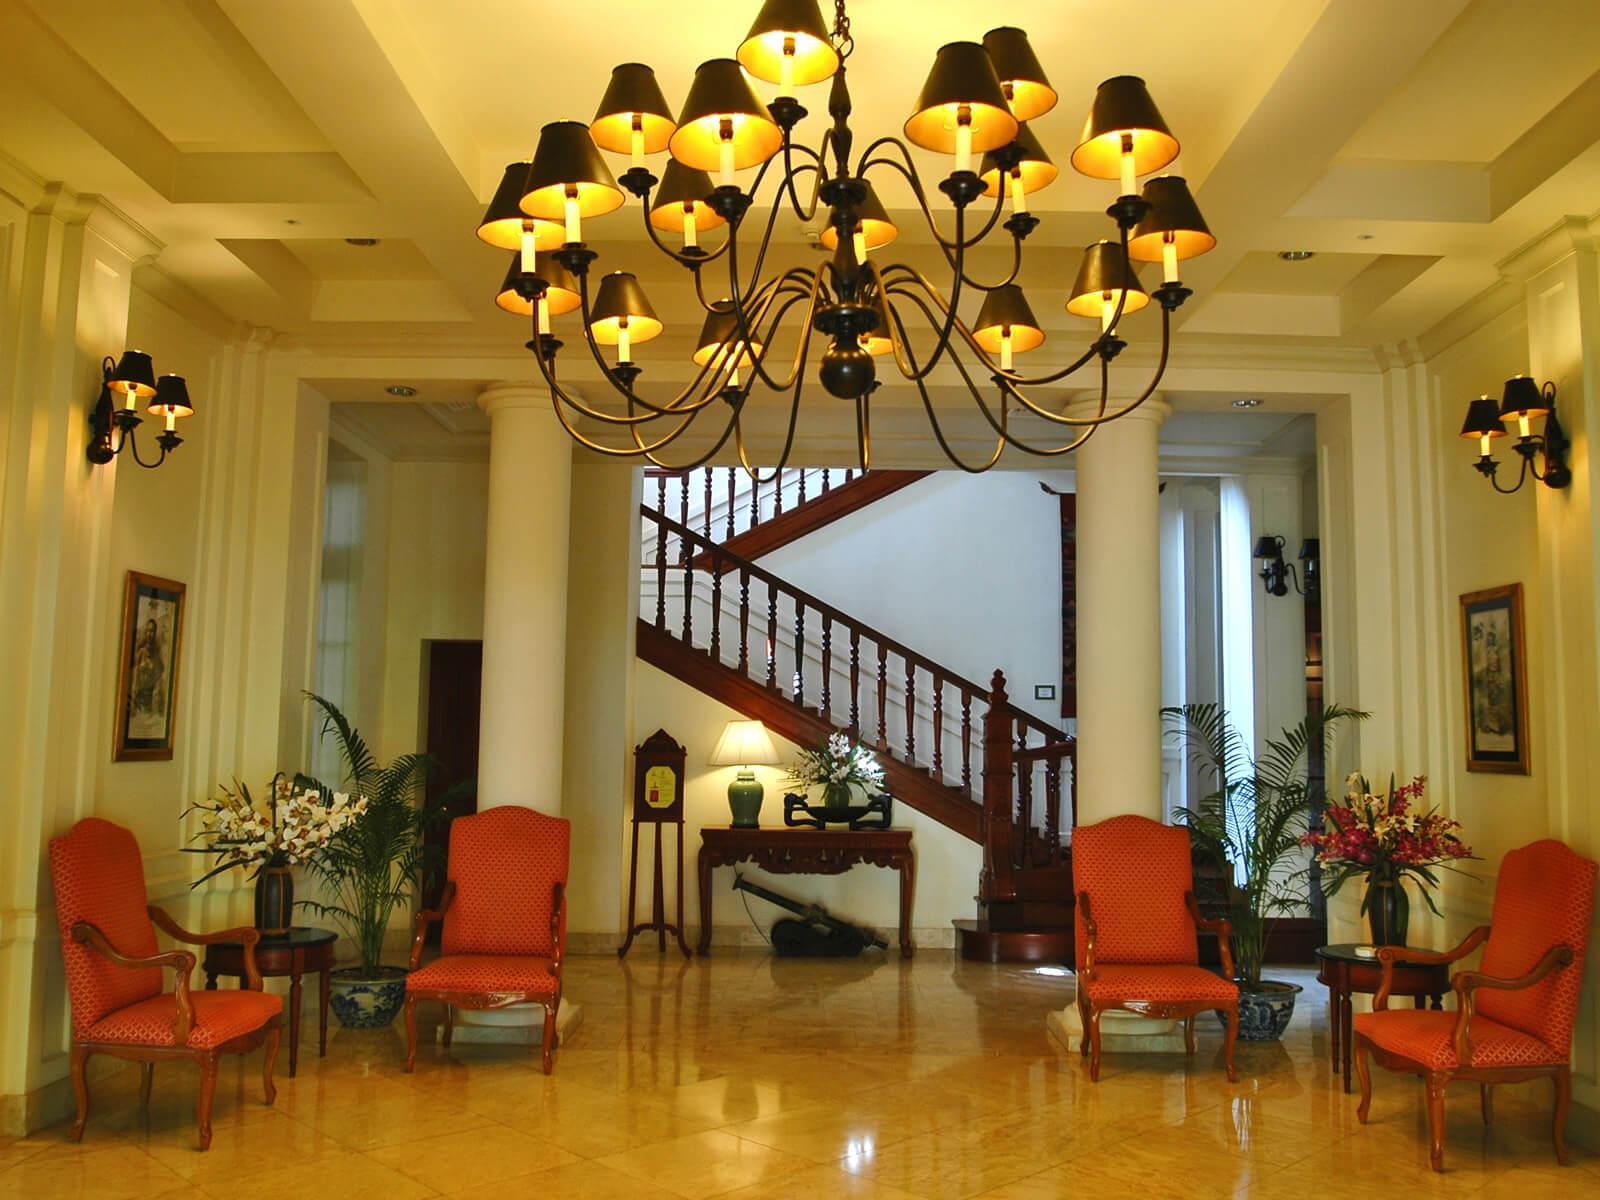 Hotels | Rama Tours